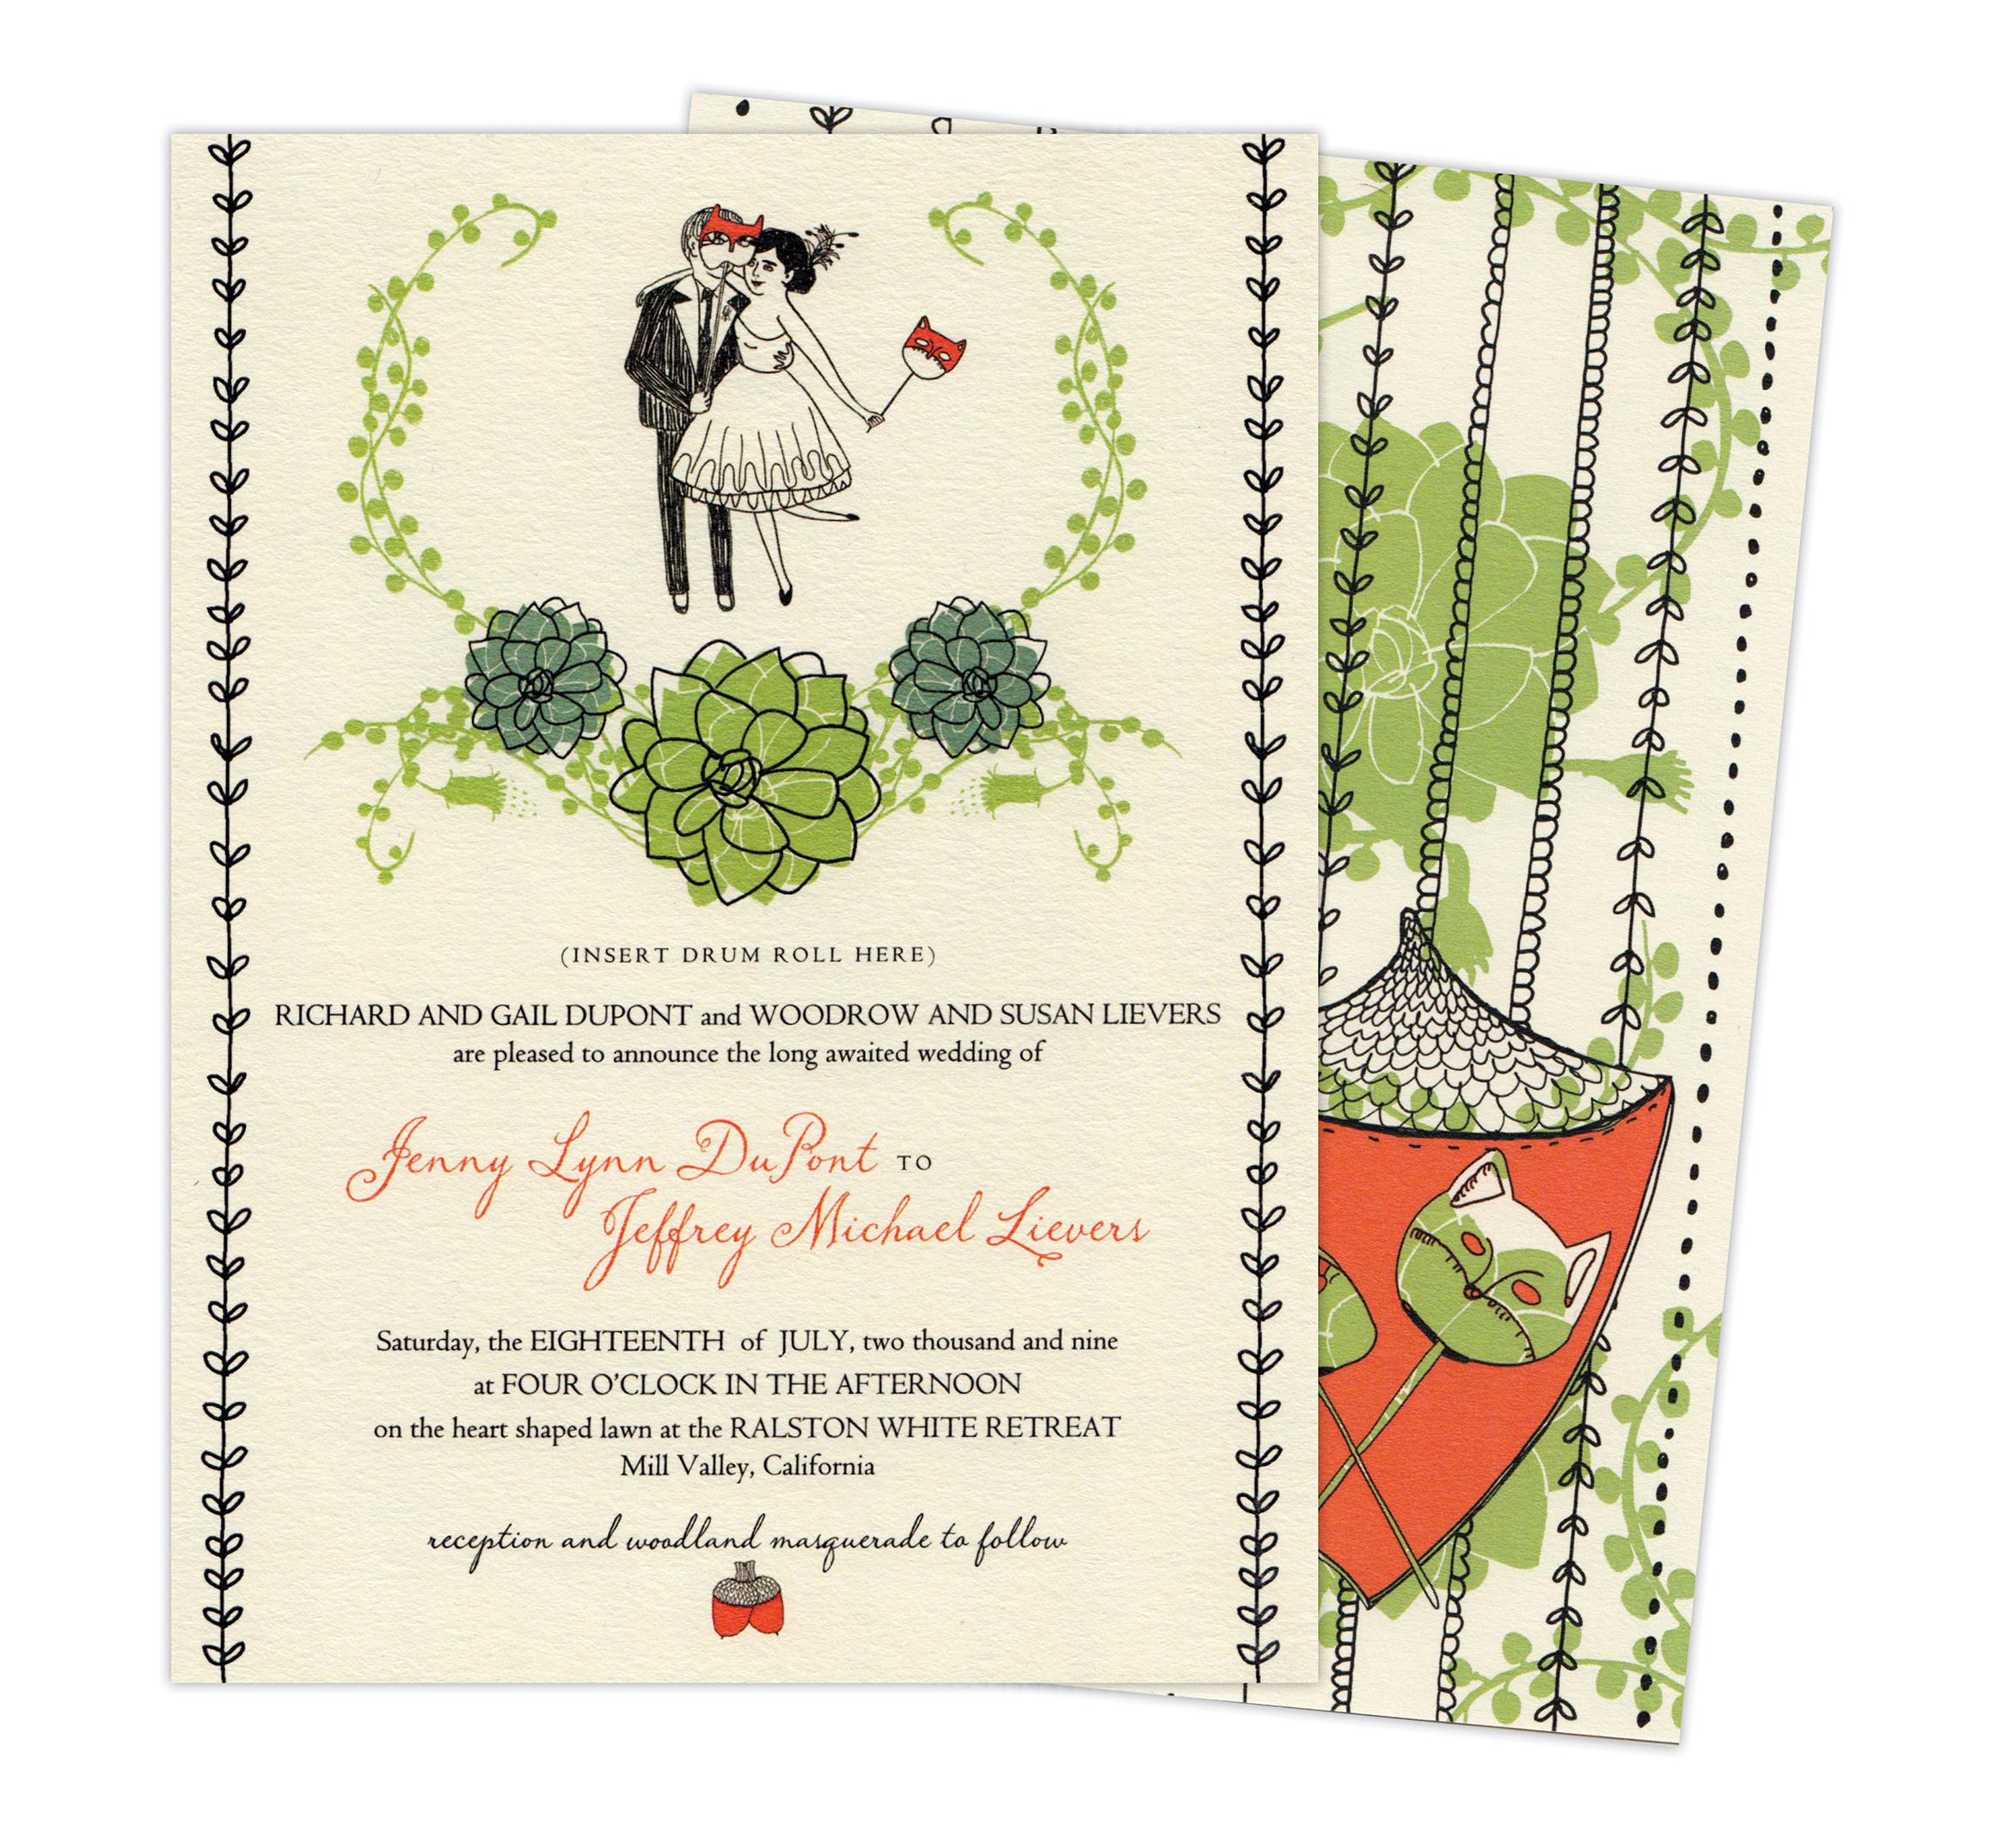 Jenny & Jeff  Wedding Invitation